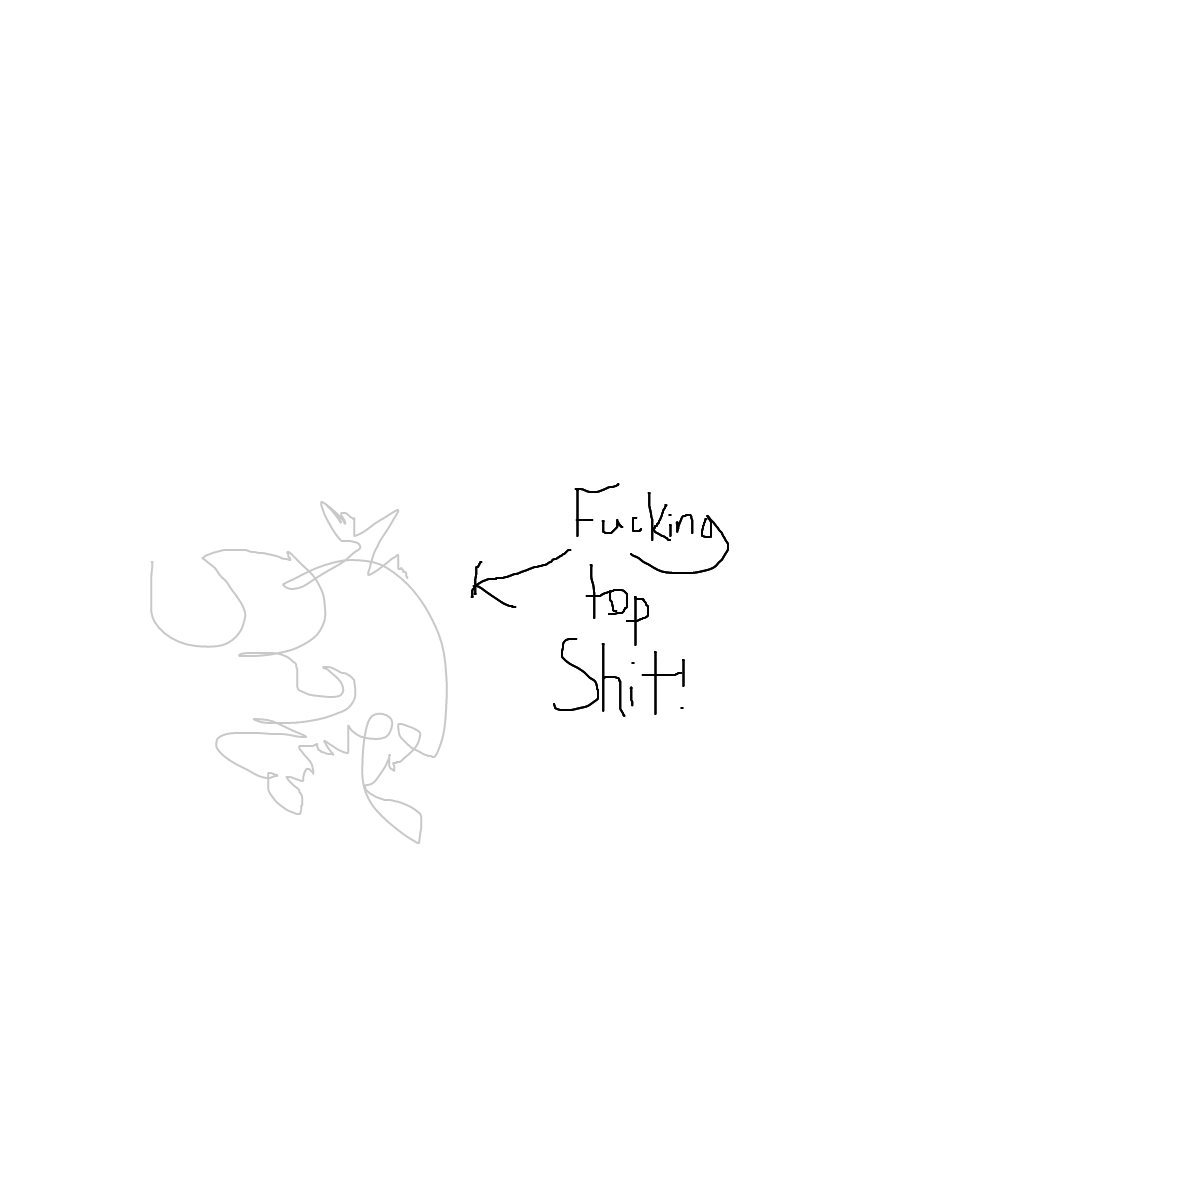 BAAAM drawing#7231 lat:30.2886753082275400lng: -97.7489852905273400